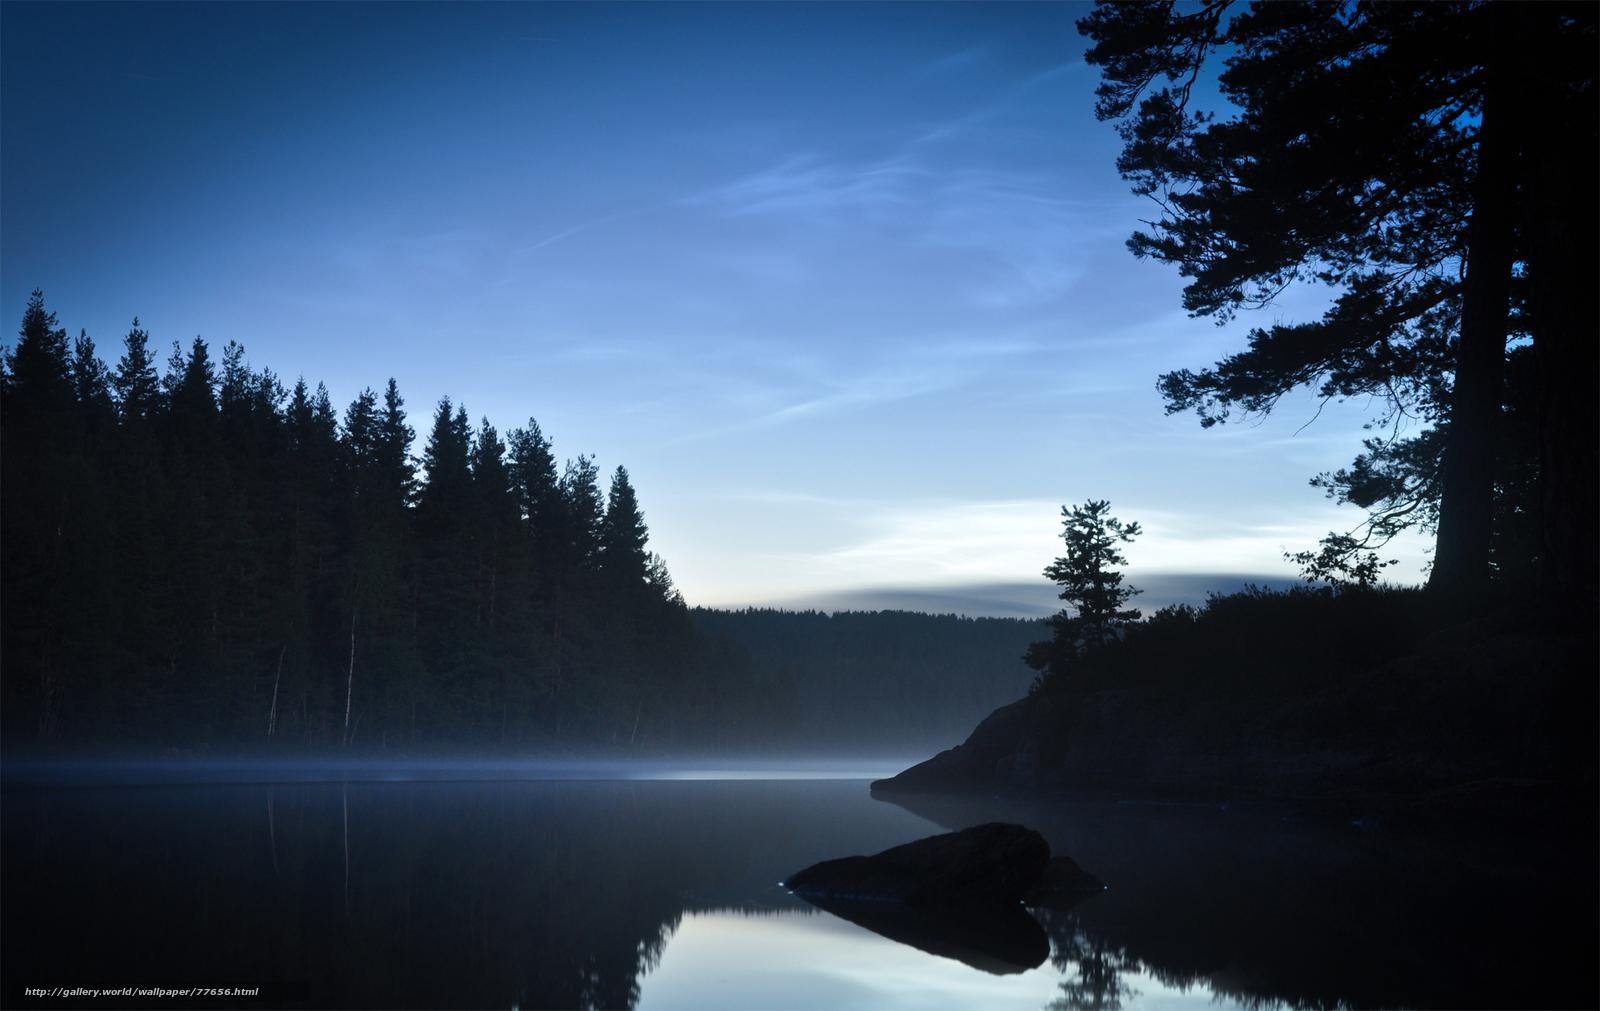 Download wallpaper Lake Trees forest desktop wallpaper in the 1600x1011